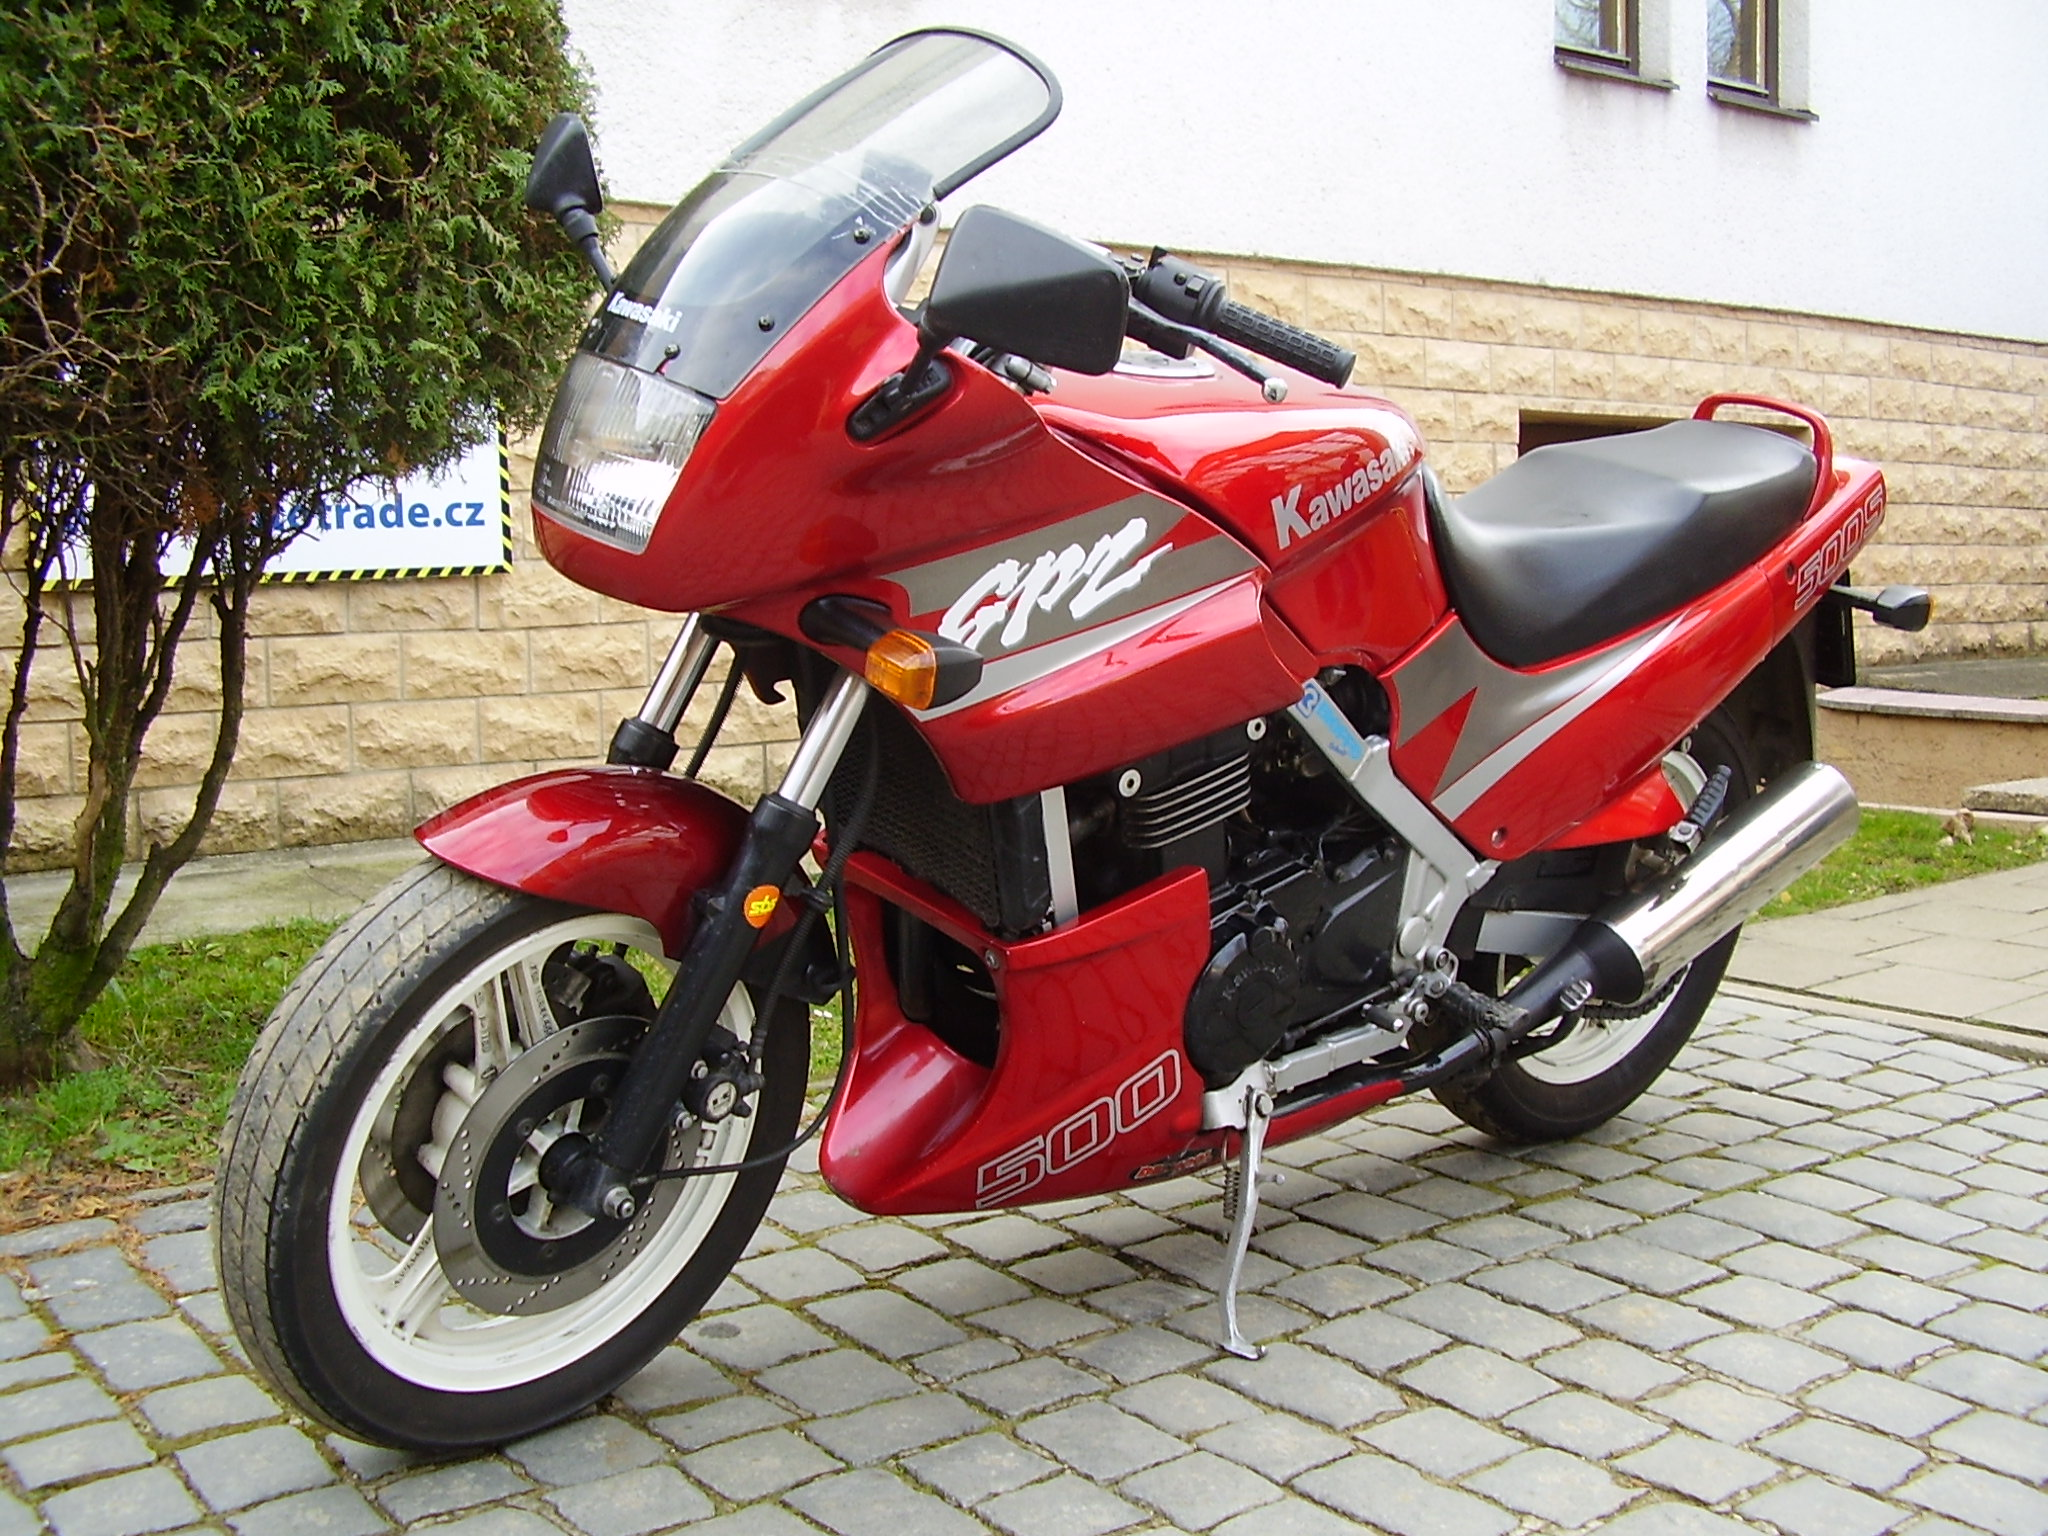 File:Kawasaki GPZ 500 S 1994 red.jpg - Wikimedia Commons